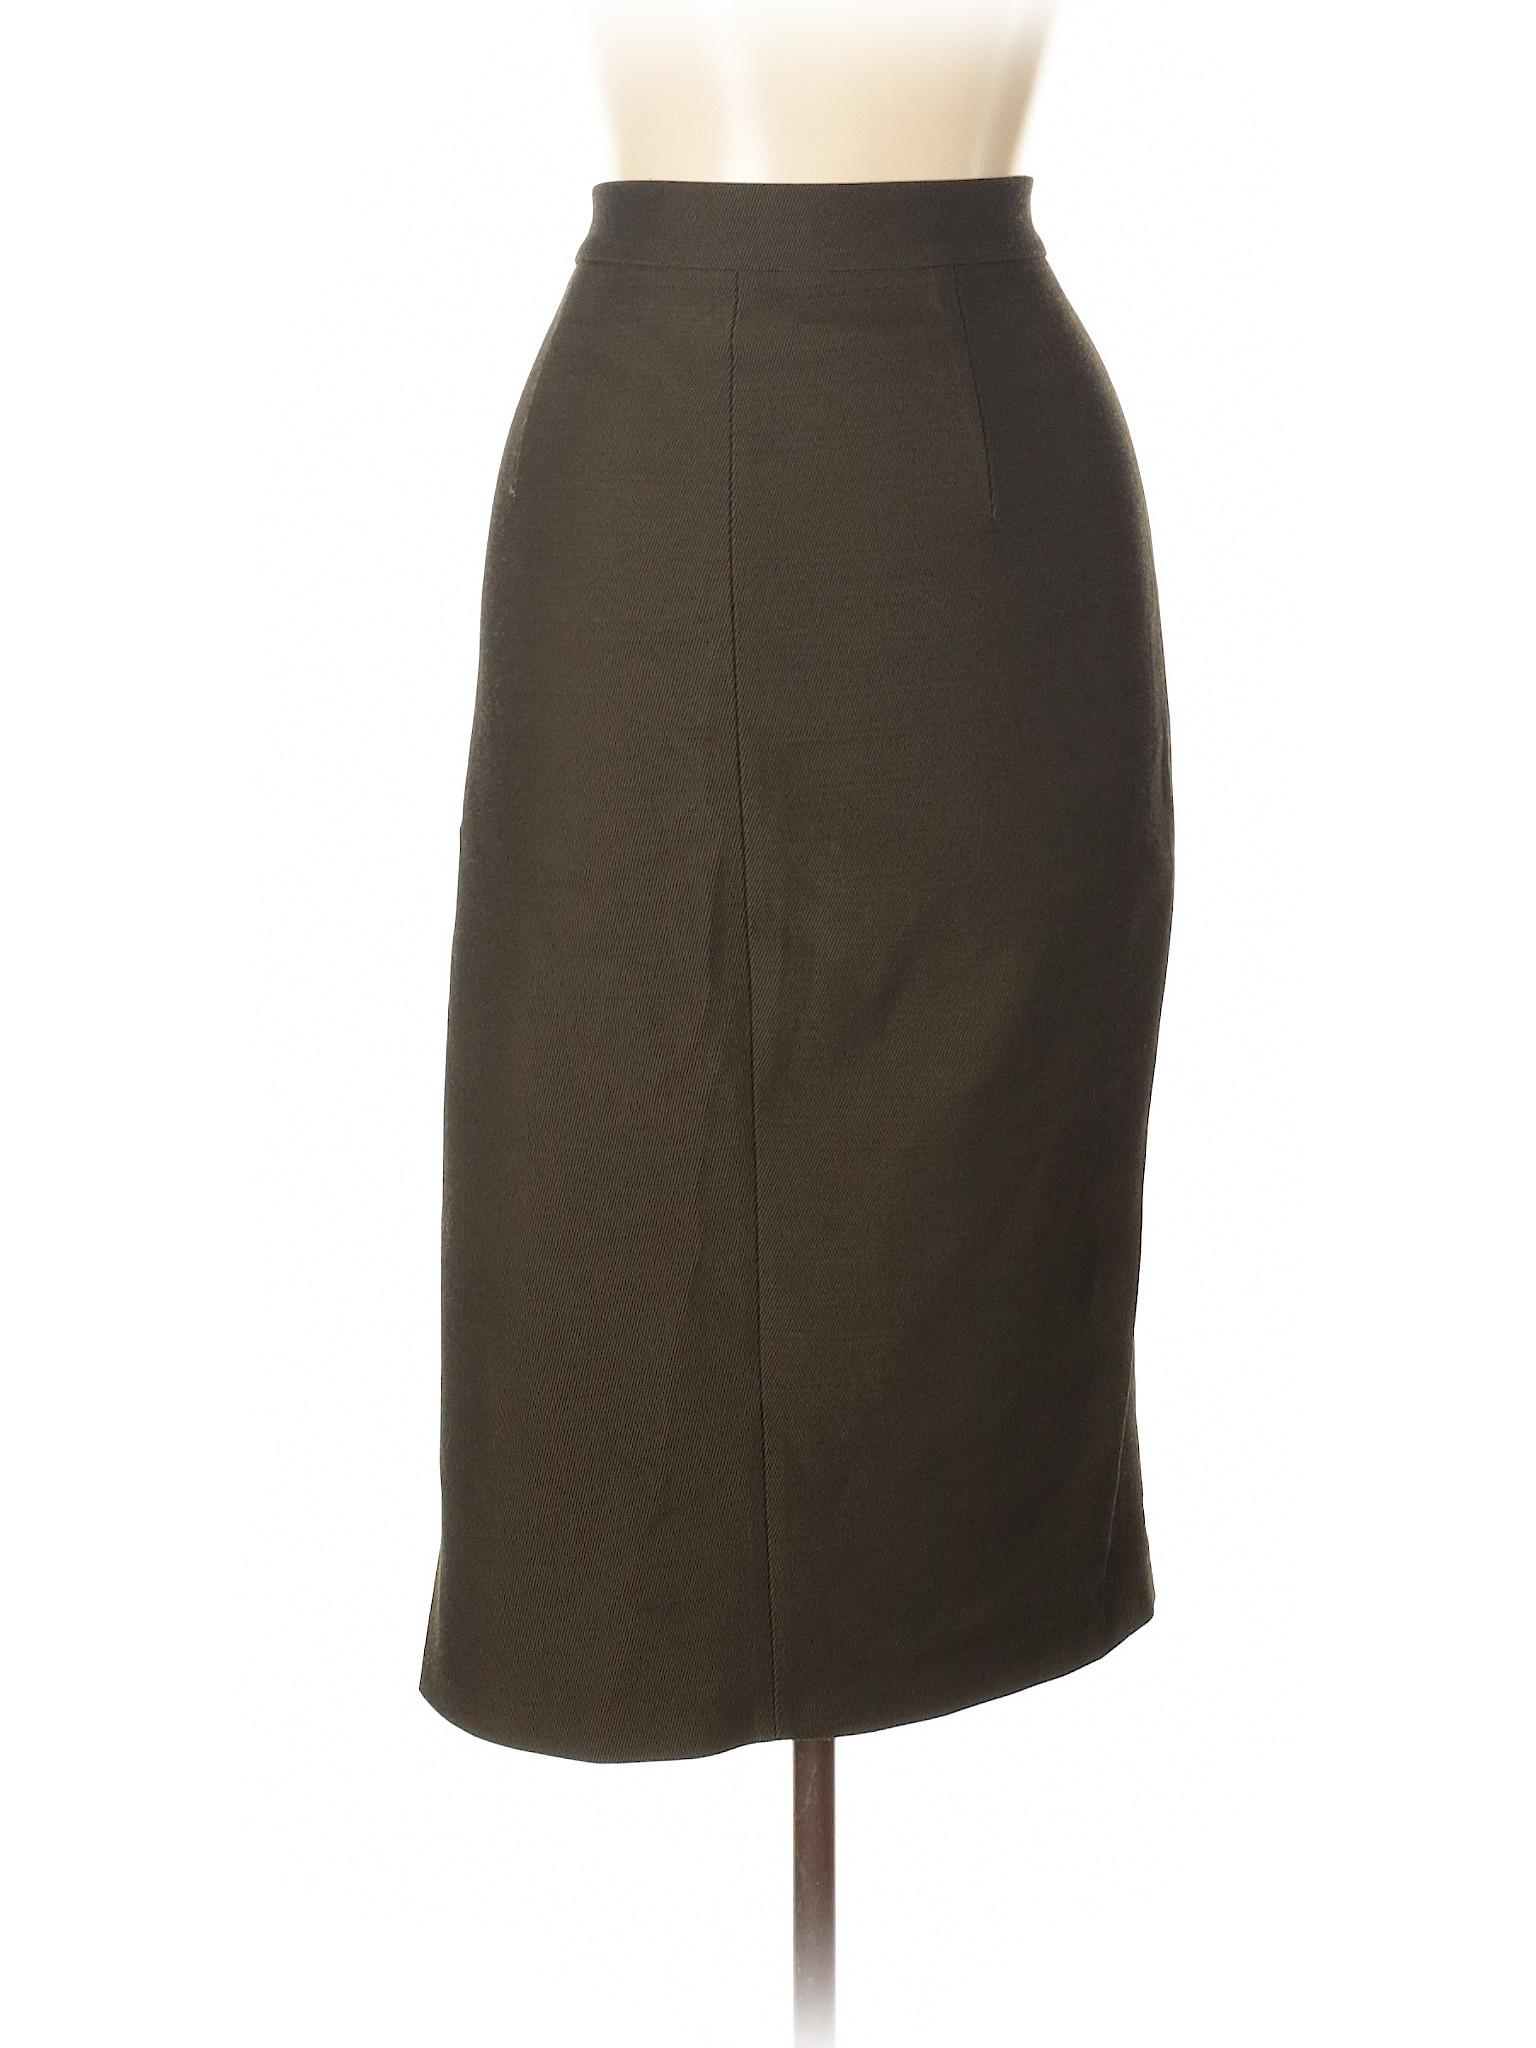 Boutique Boutique Boutique Zara Zara Zara Skirt Casual Casual Boutique Casual Zara Skirt Skirt xAwZgqz